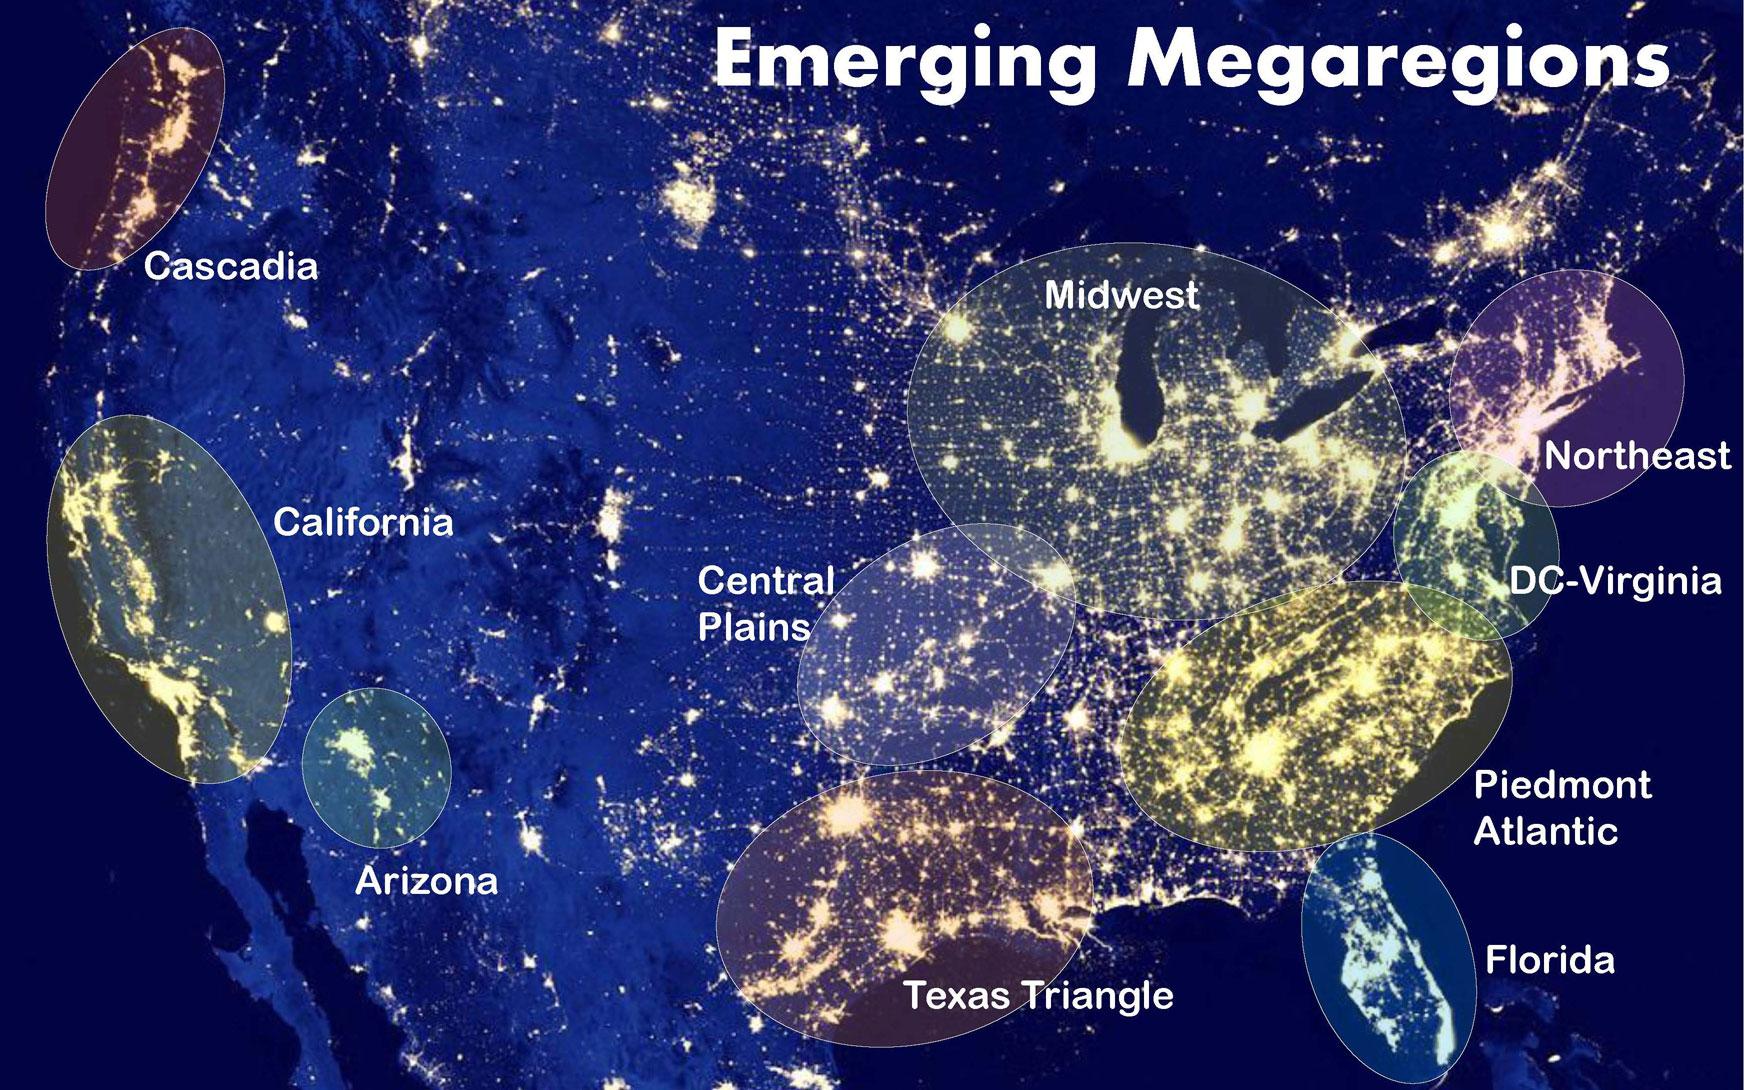 High Resolution Map Megaregions Planning FHWA - Us megaregions map the atlantic